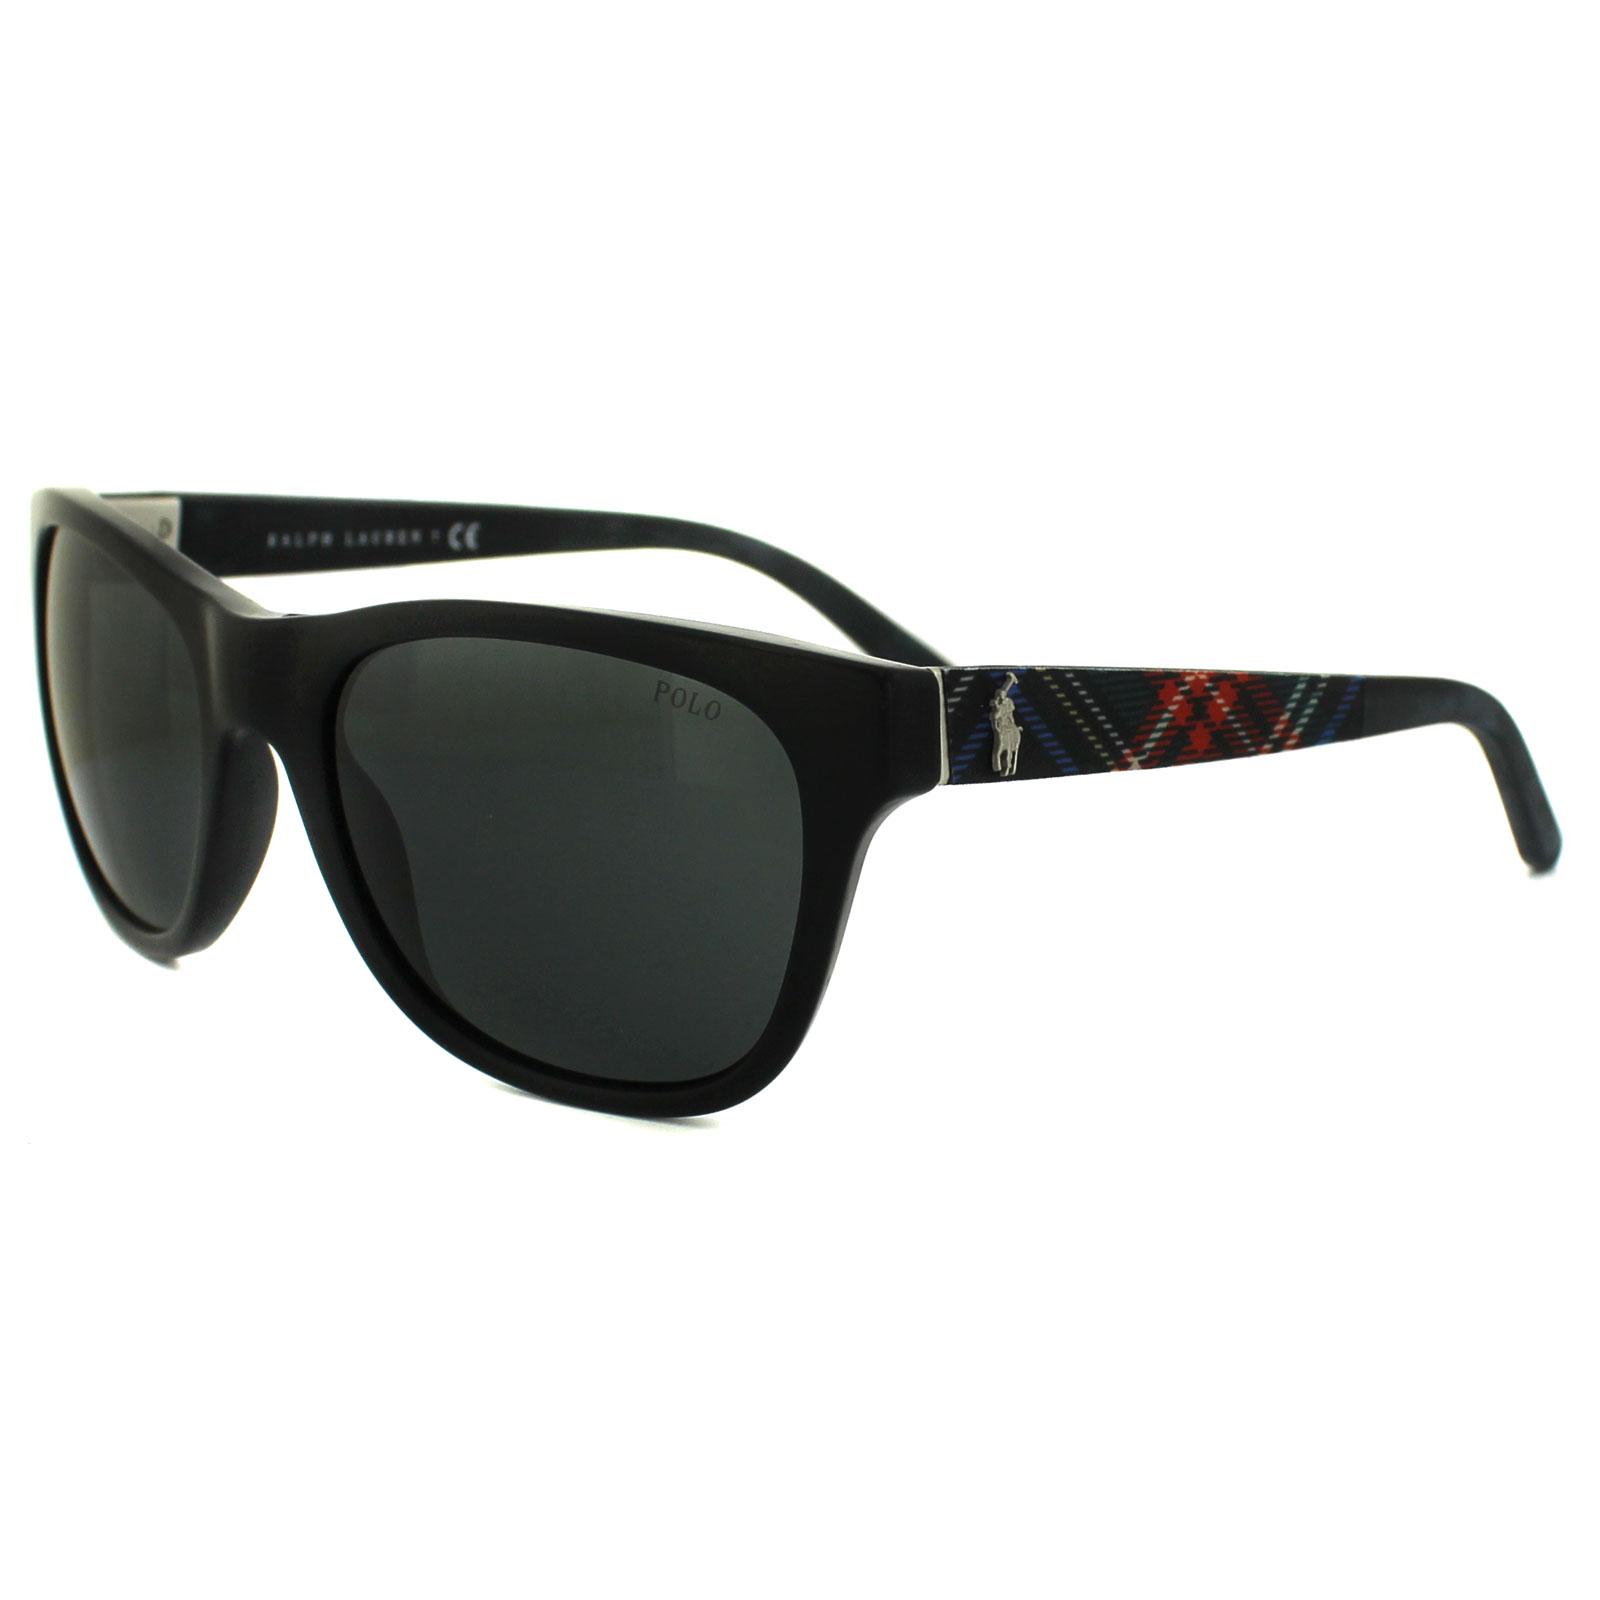 153ca943a690 Cheap Polo Ralph Lauren 4091 Sunglasses - Discounted Sunglasses